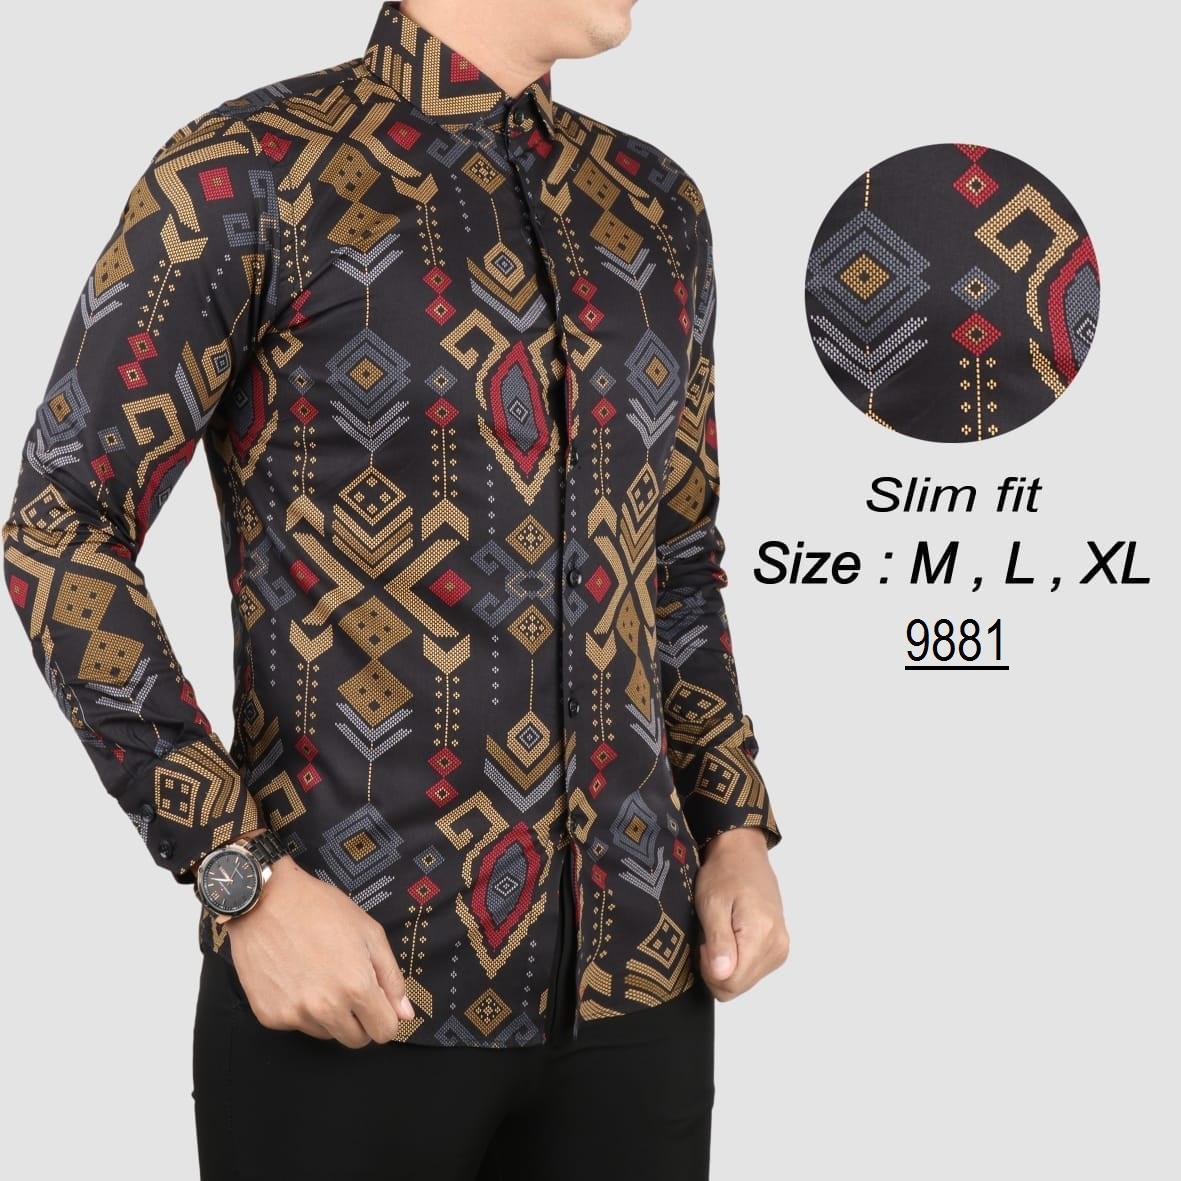 Batik Pria Modern Kemeja Batik Pria Slim fit WW01J